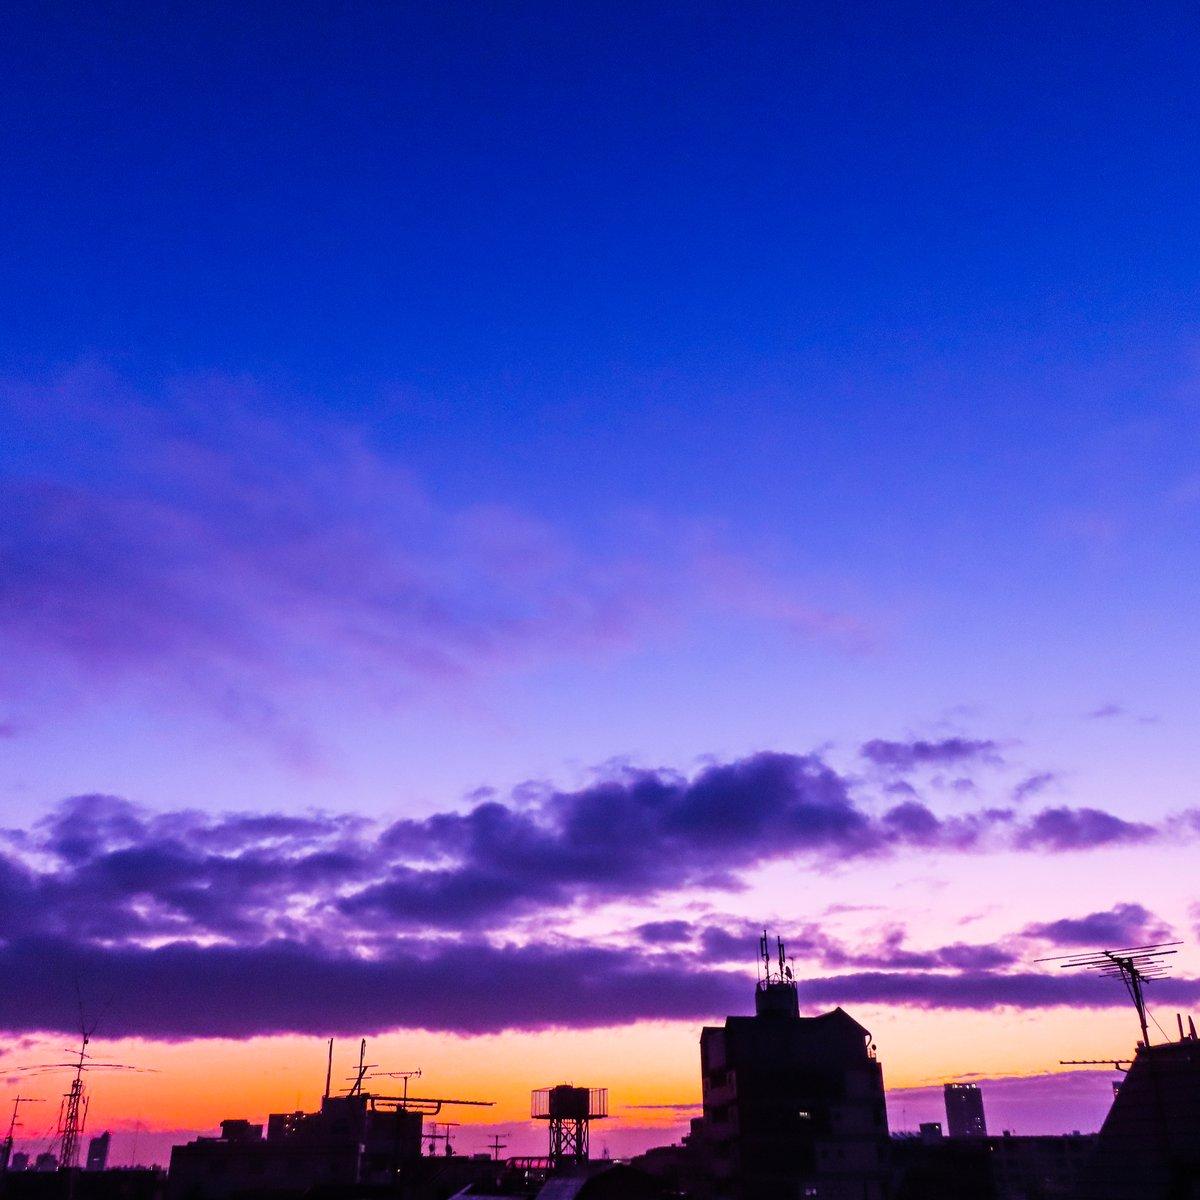 #morning #glow #sky #cloud